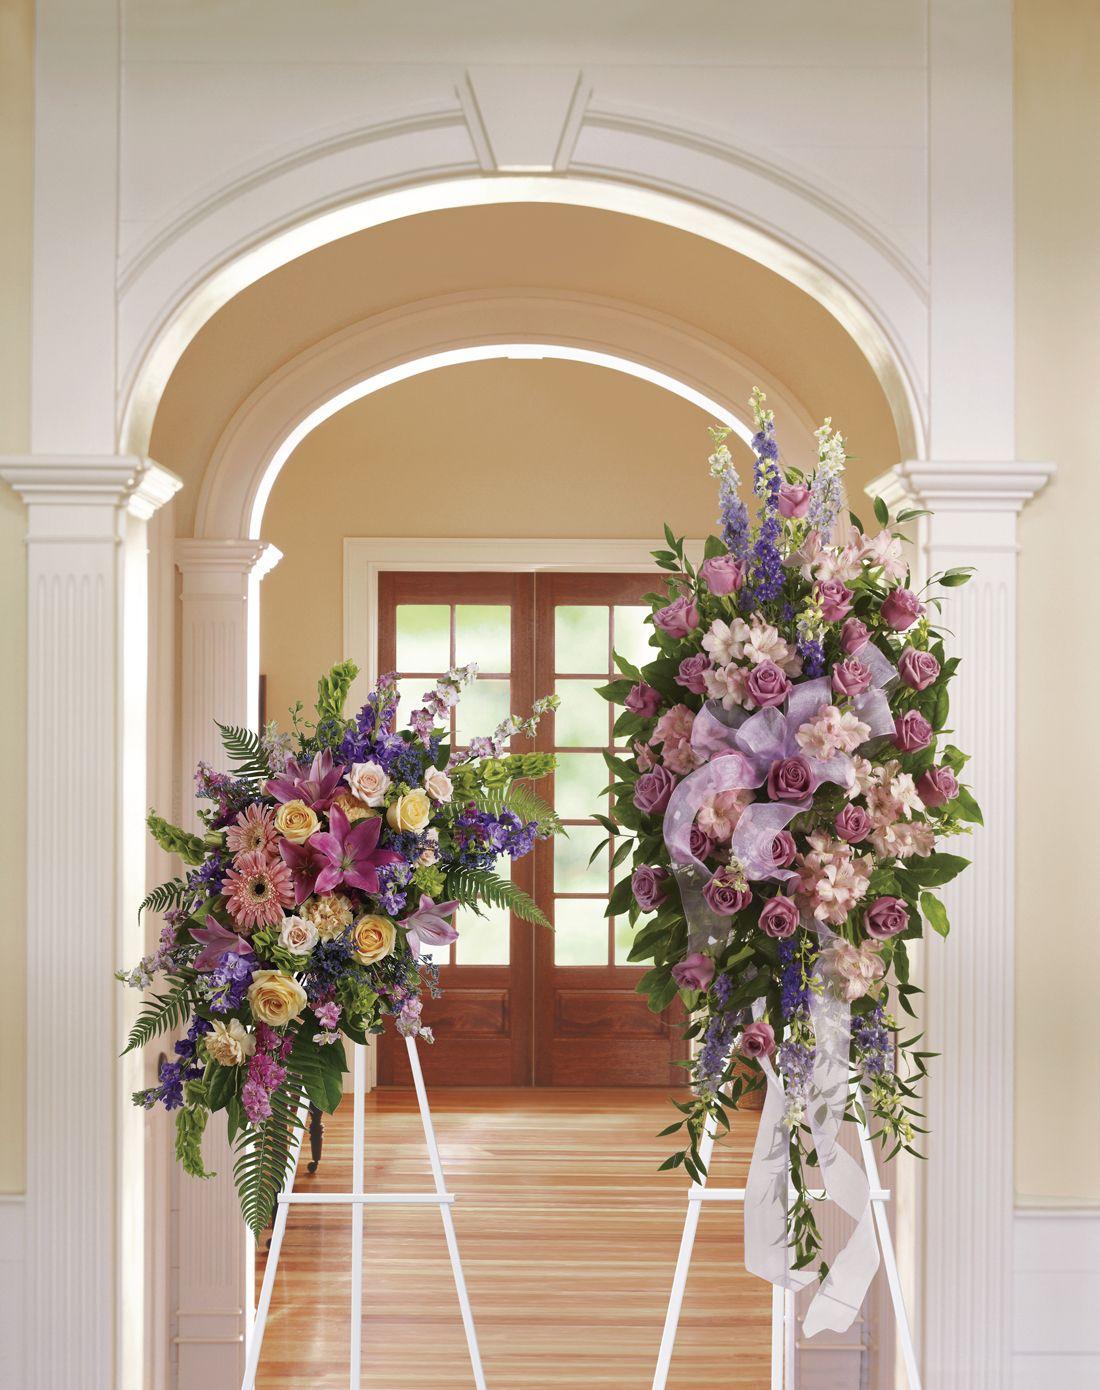 Sympathy Funeral flowers, Sympathy flowers